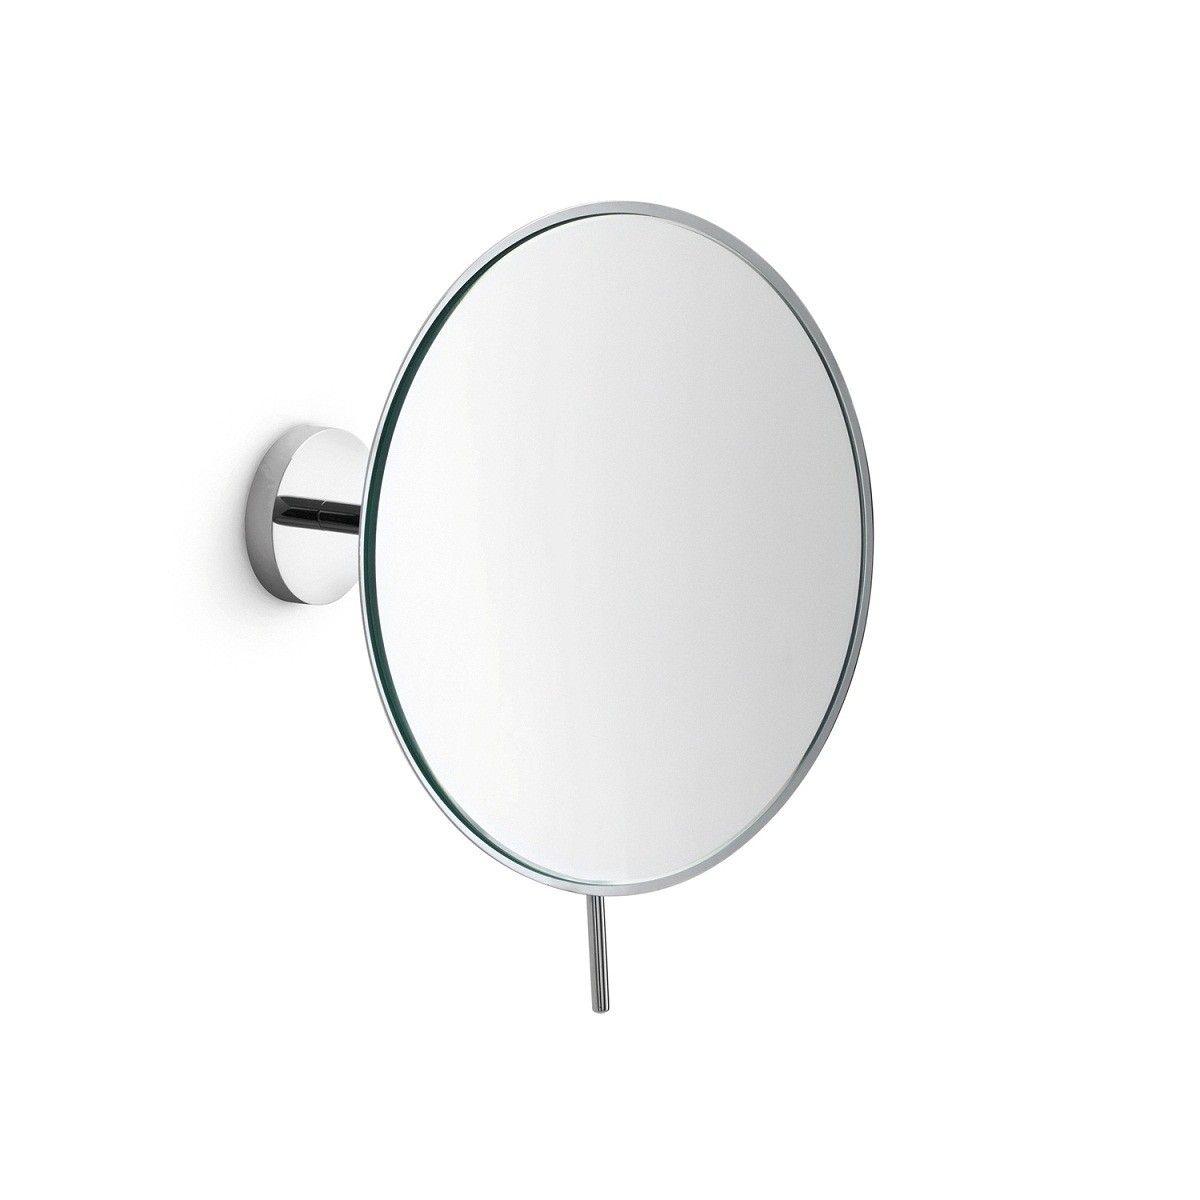 Ws Bath Collections Mevedo 55963 Magnifying Mirror 3x Wall